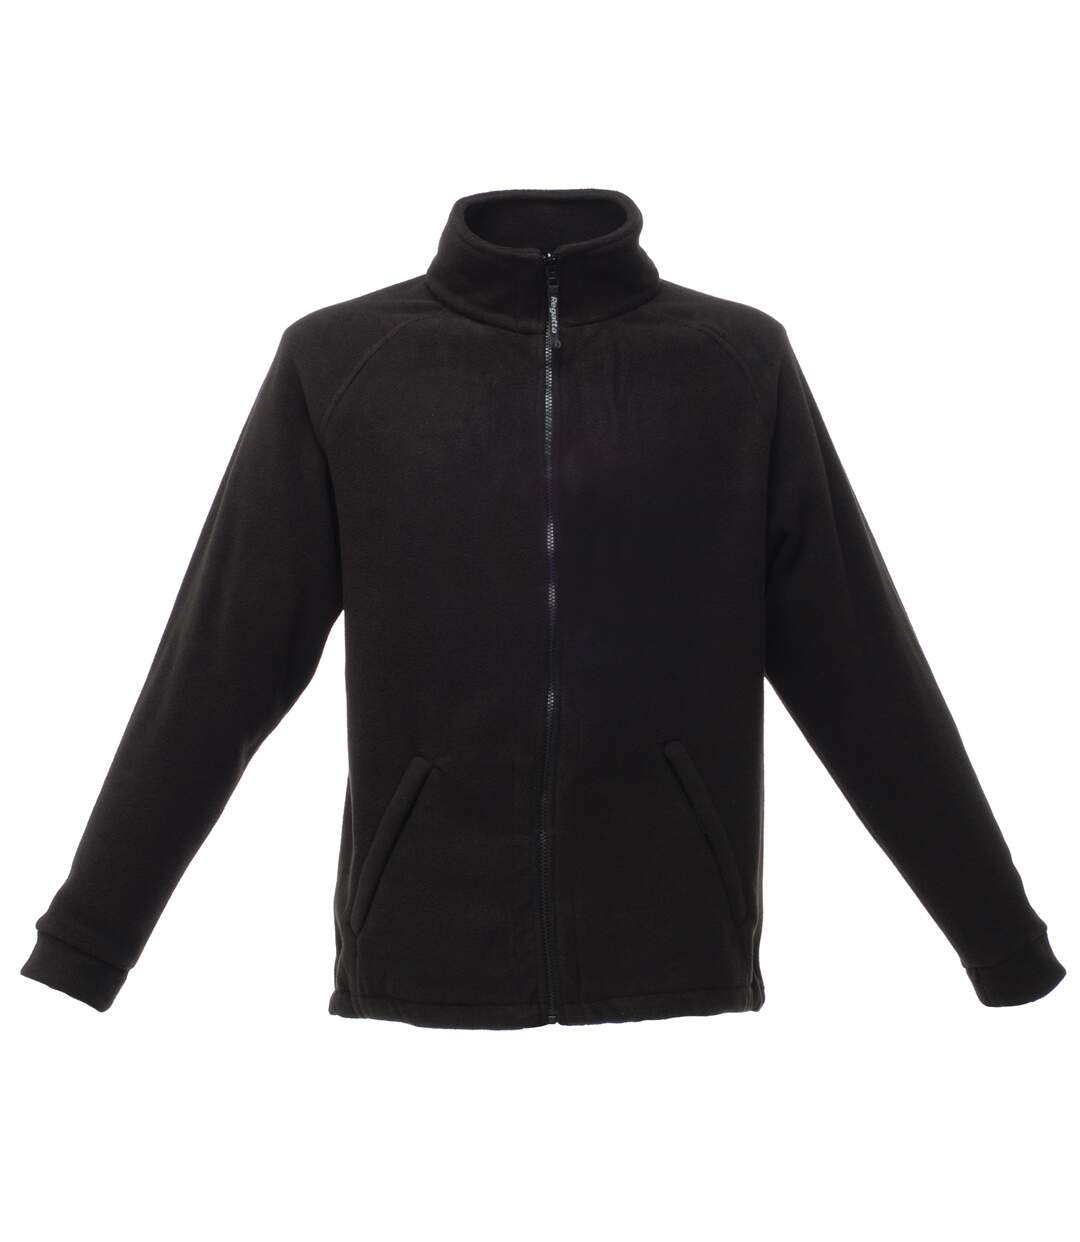 Regatta Sigma Symmetry Heavyweight Anti-Pill Fleece Jacket (380 GSM) (Black) - UTBC809